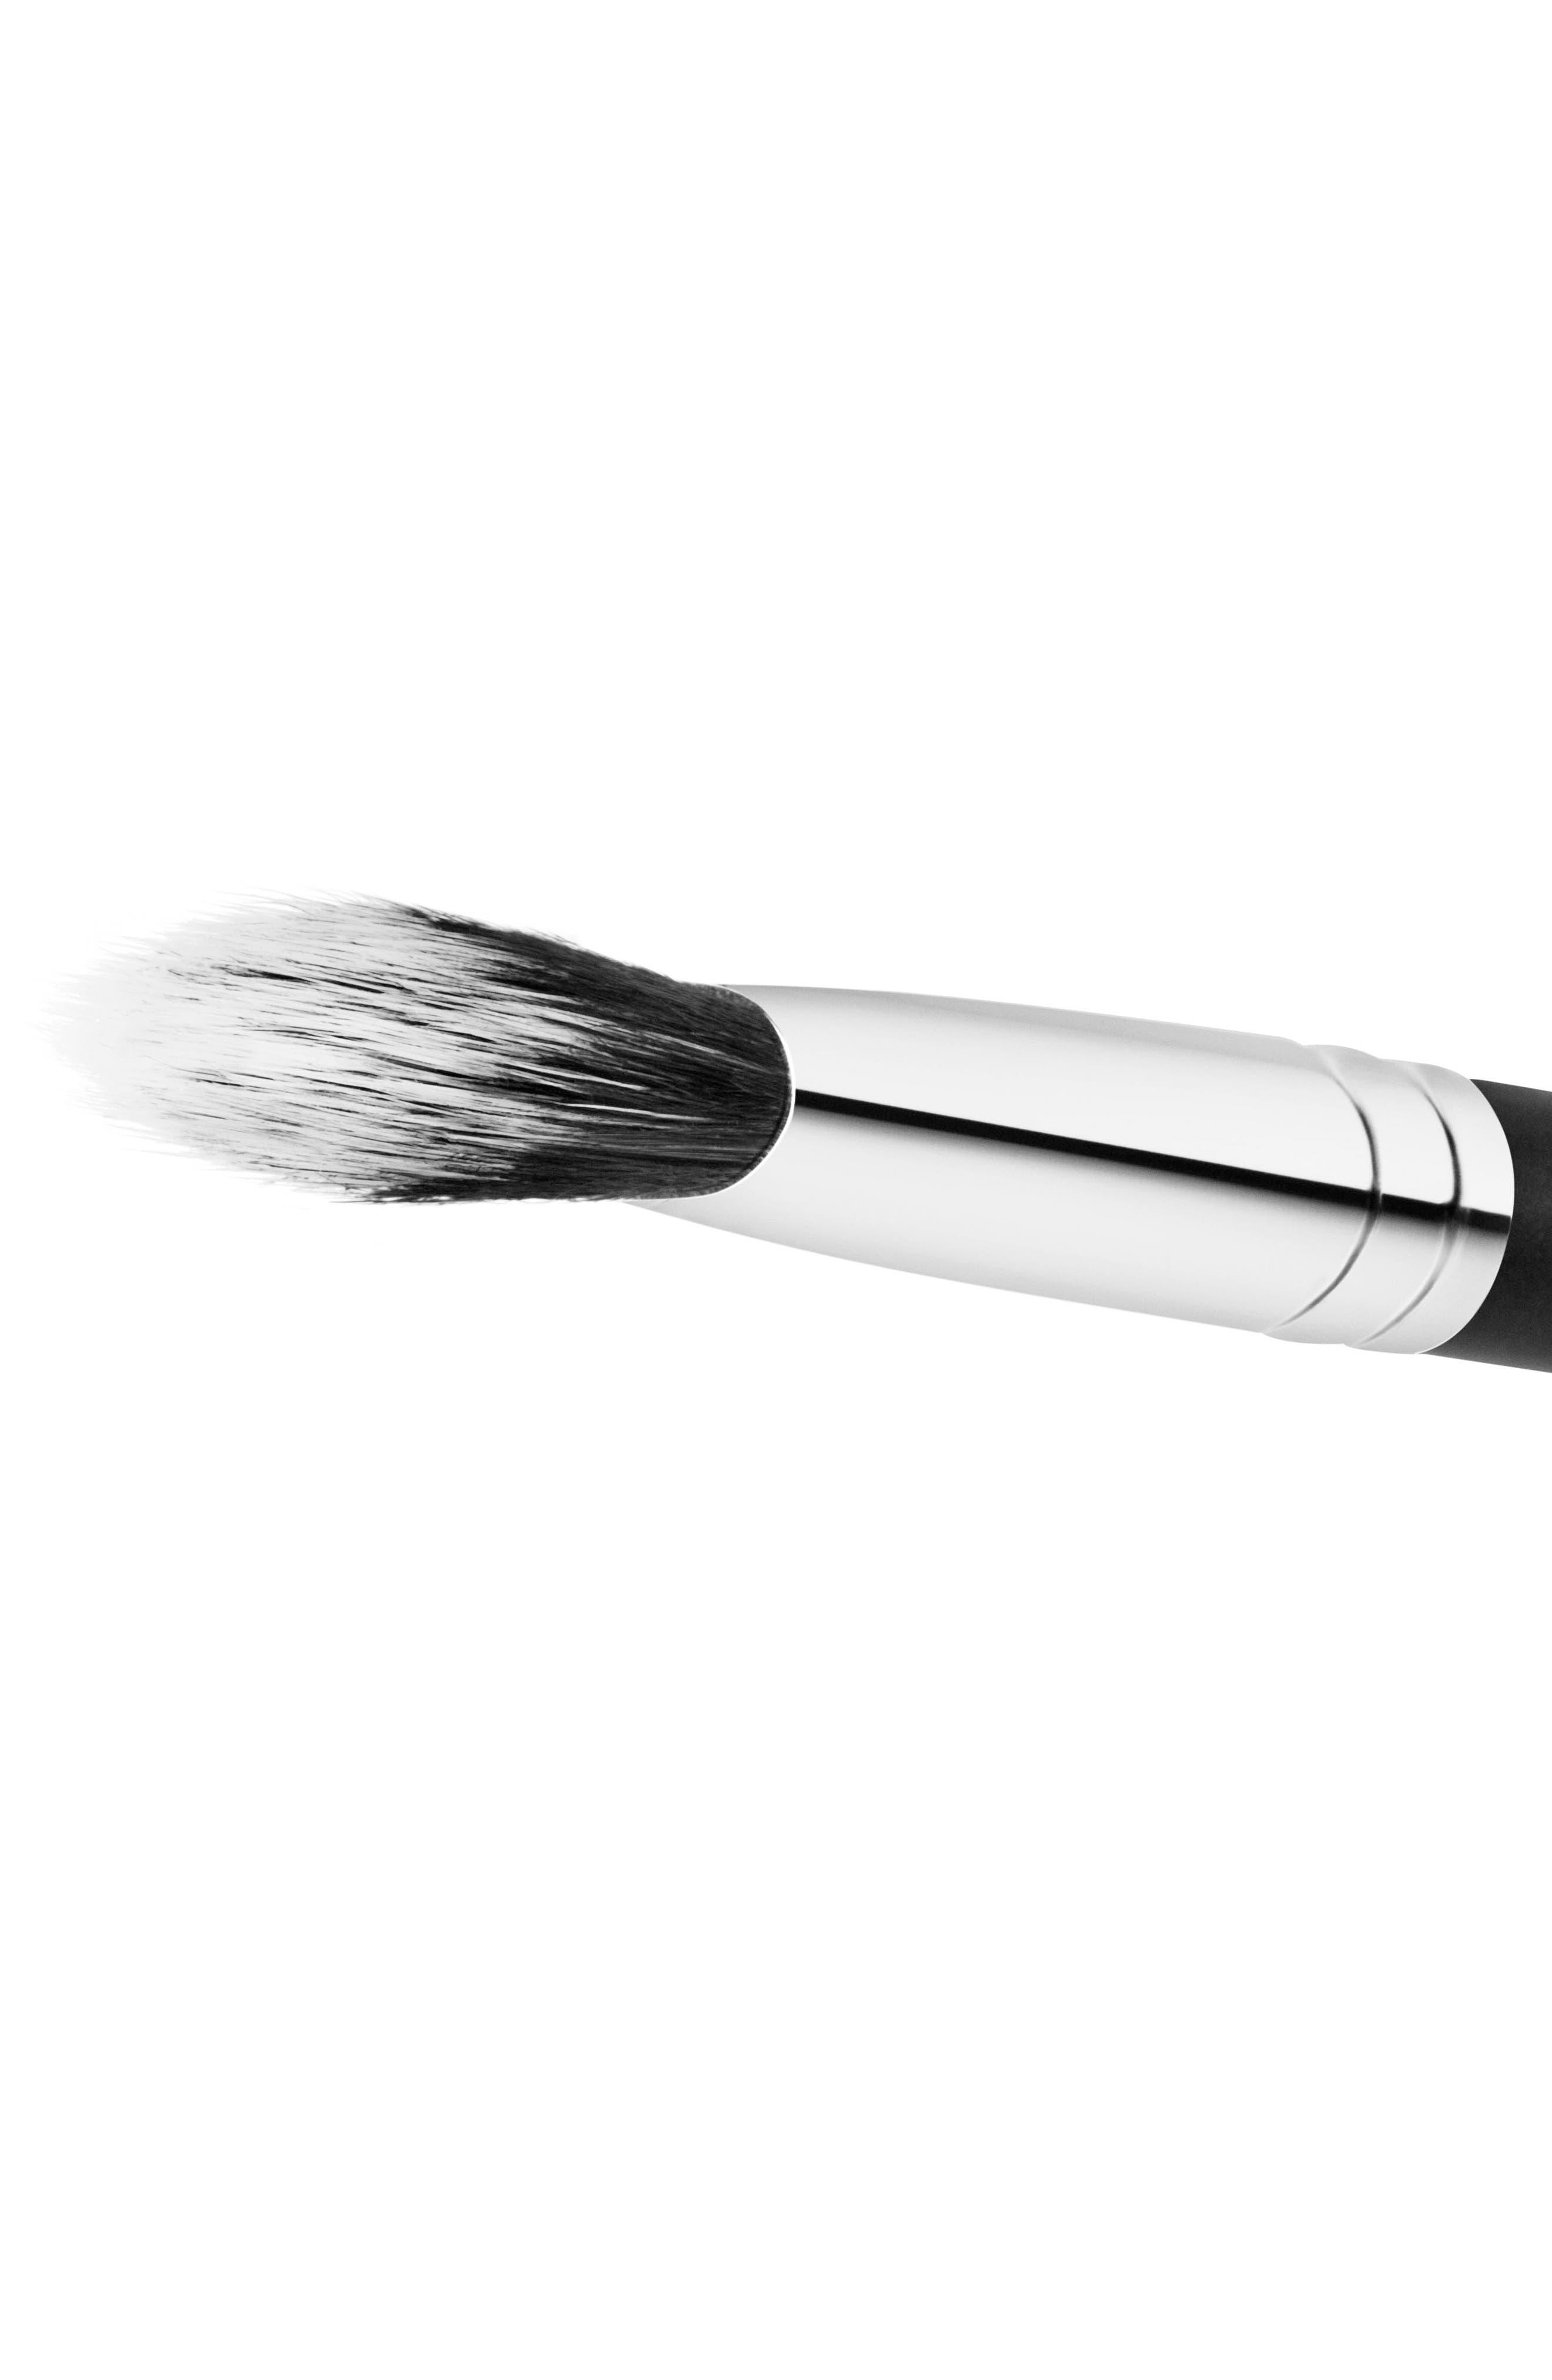 MAC COSMETICS,                             MAC 132S Synthetic Duo Fibre Foundation Brush,                             Alternate thumbnail 2, color,                             NO COLOR